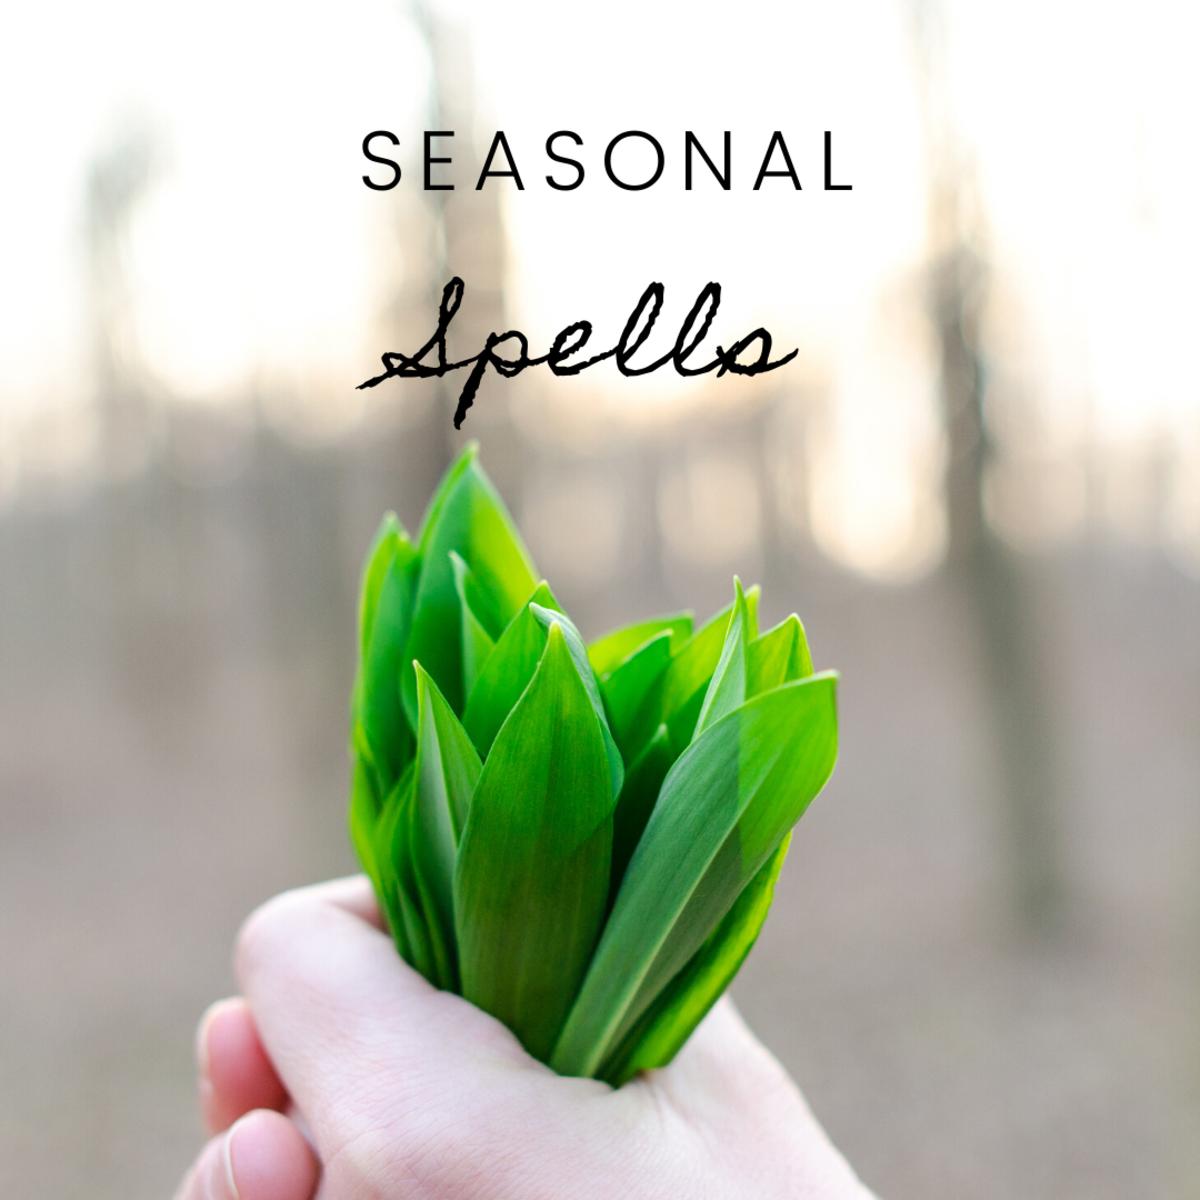 Seasonal Spells